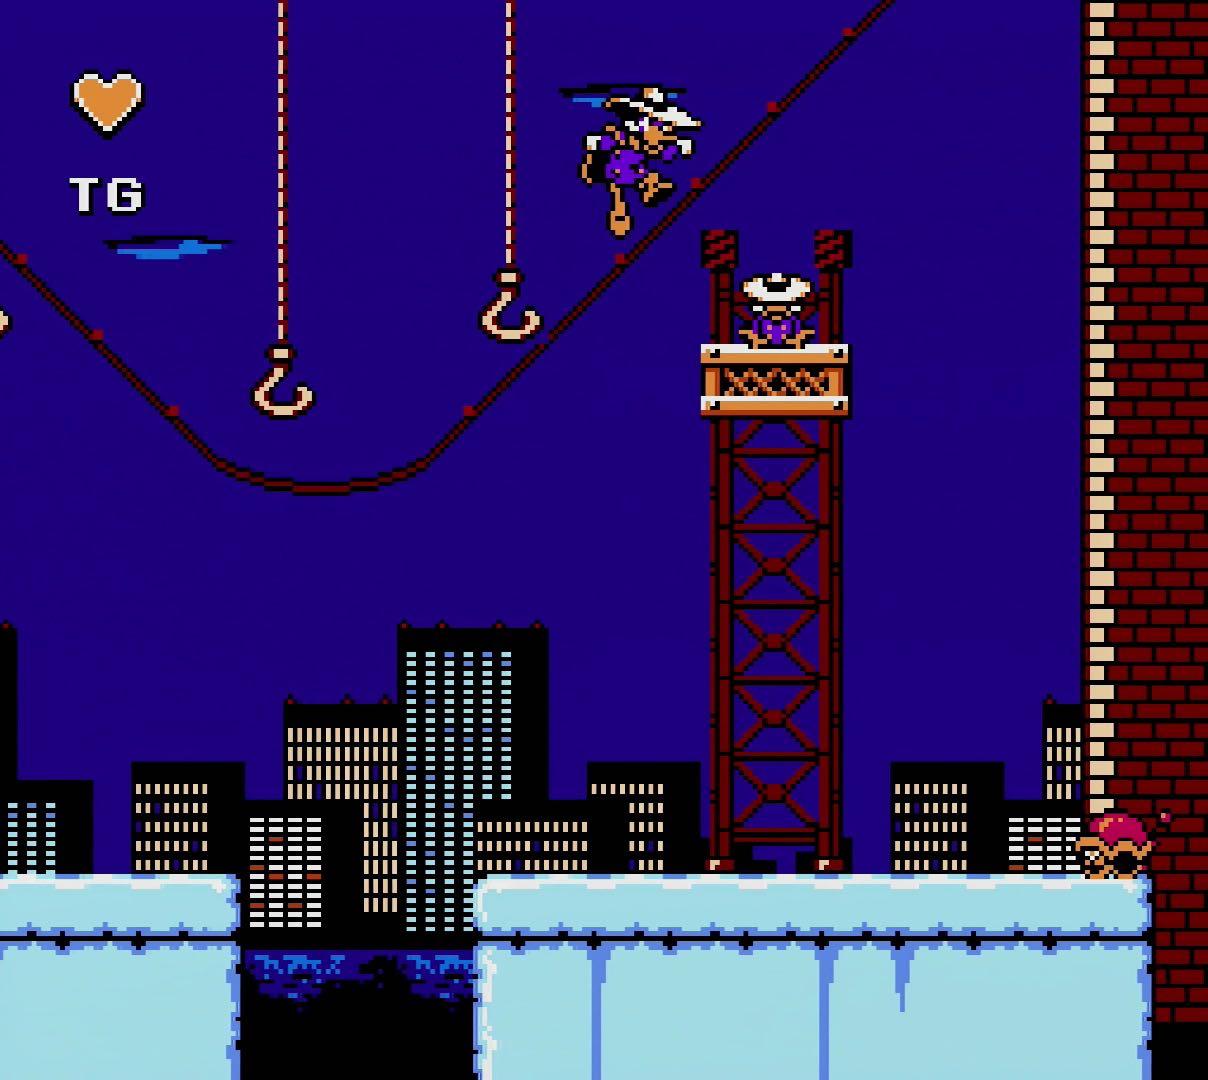 [Análise Retro Game] - Darkwing Duck - NES Final-fantasy-1-gba-screen-shot-2016-08-24-8-54-pm